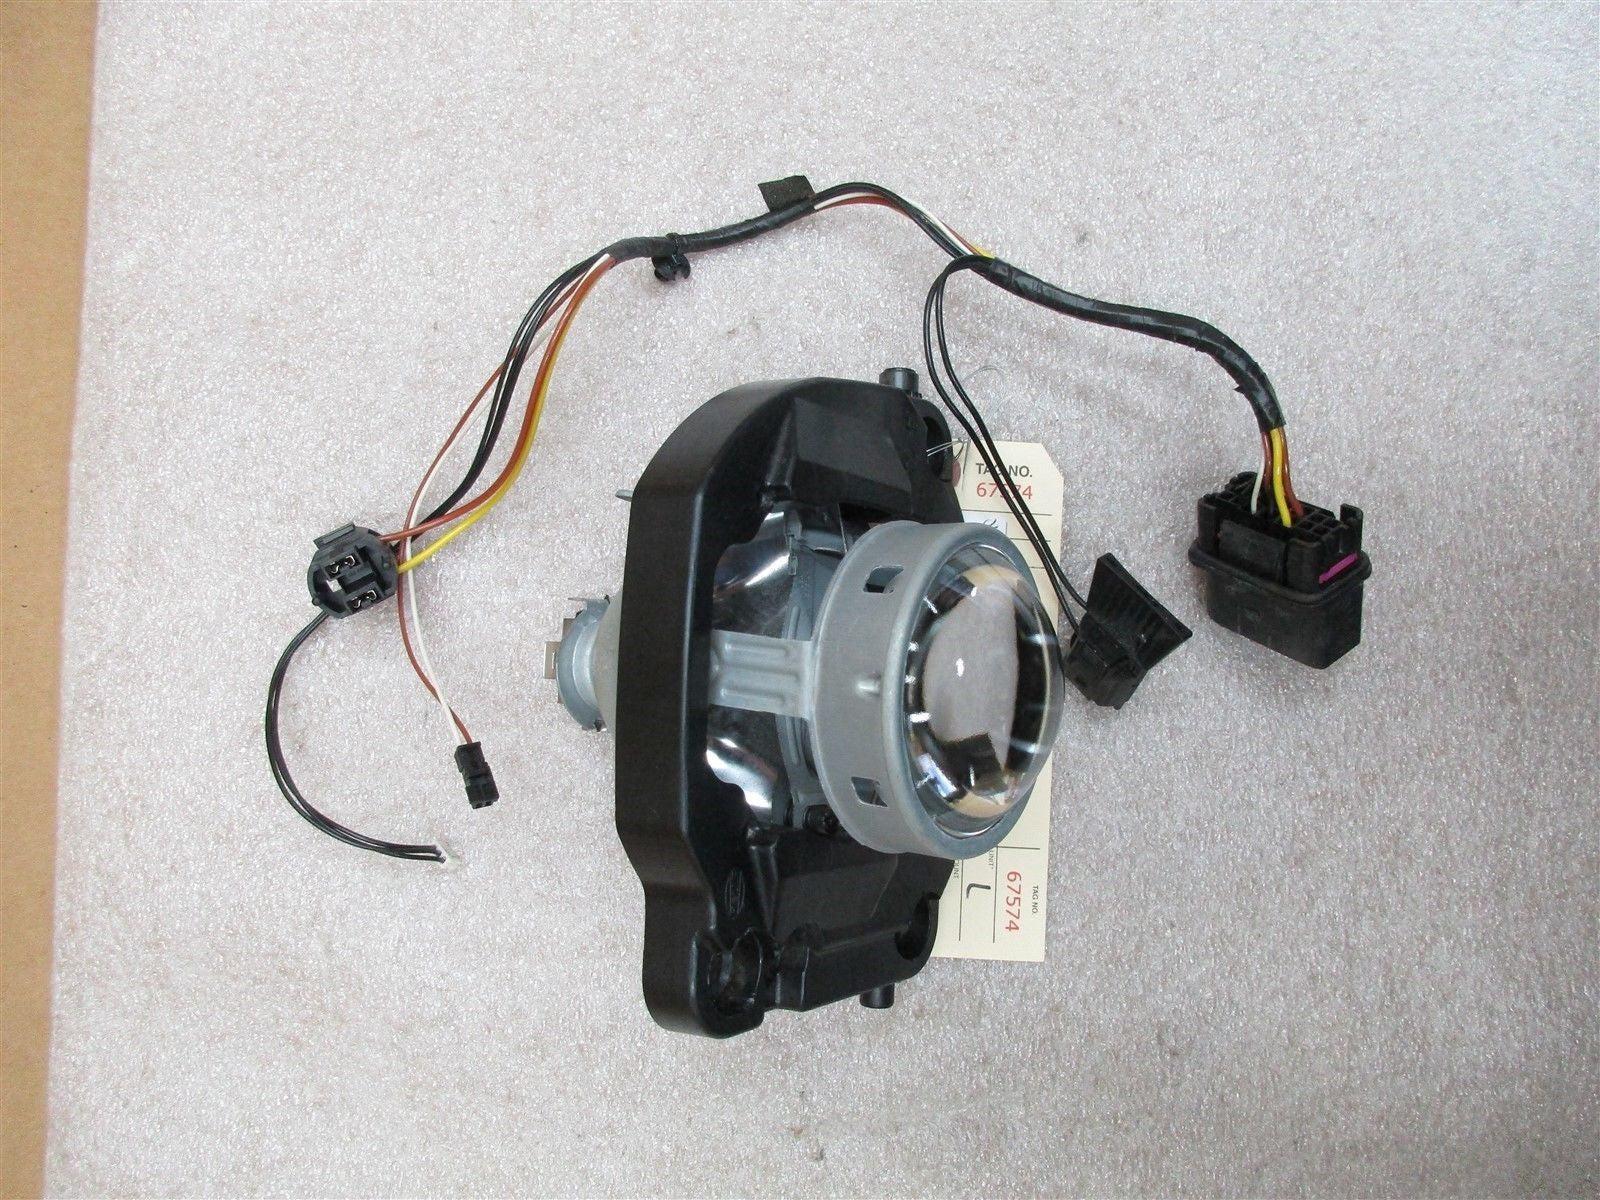 small resolution of 08 cayenne s awd porsche 957 l headlight hardware wiring harness 122 873